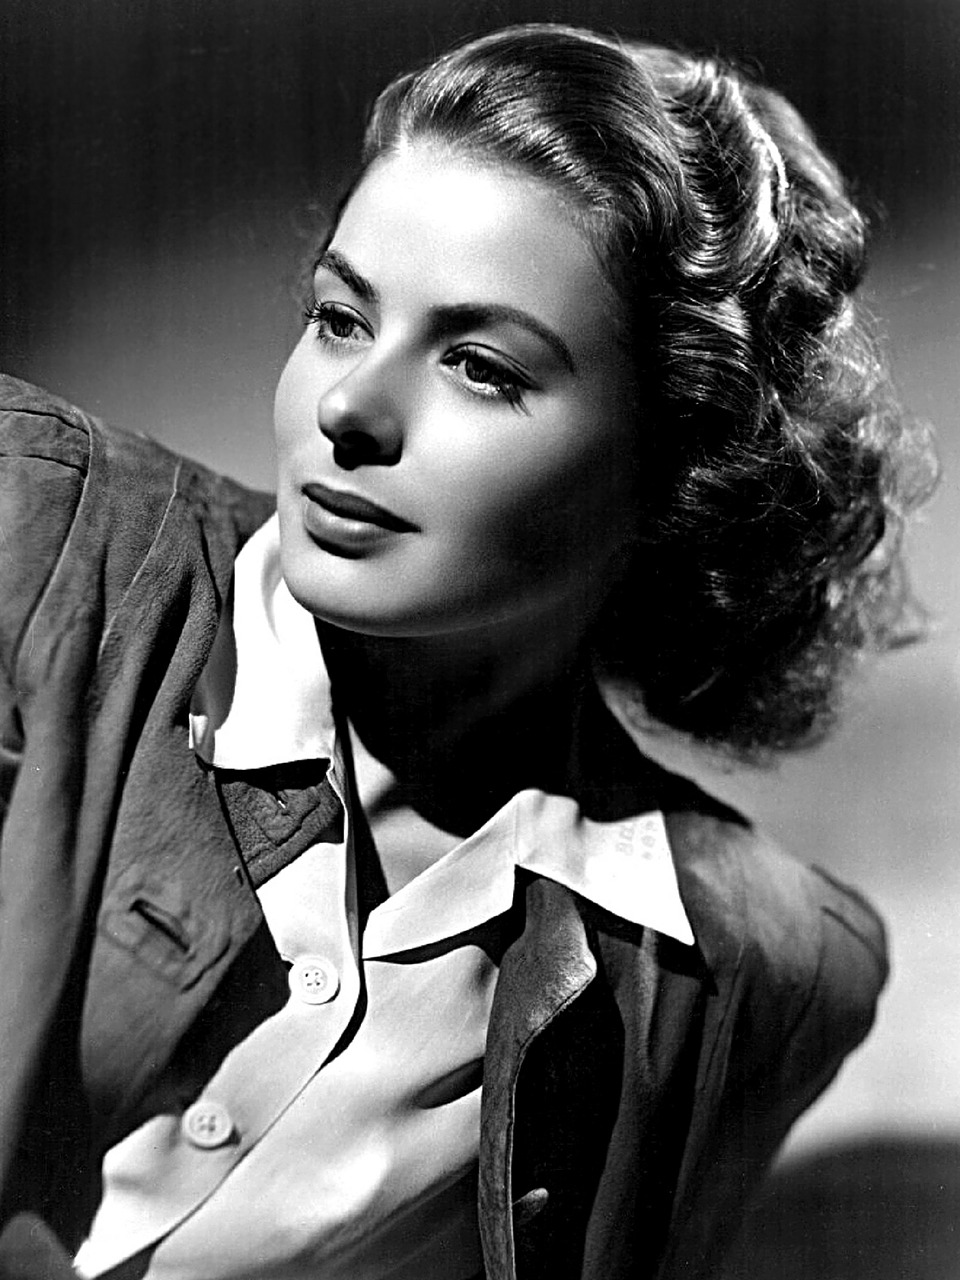 How to dress like a 1940s glamorous icon! Как же одеться, как иконы гламура 1940-х !